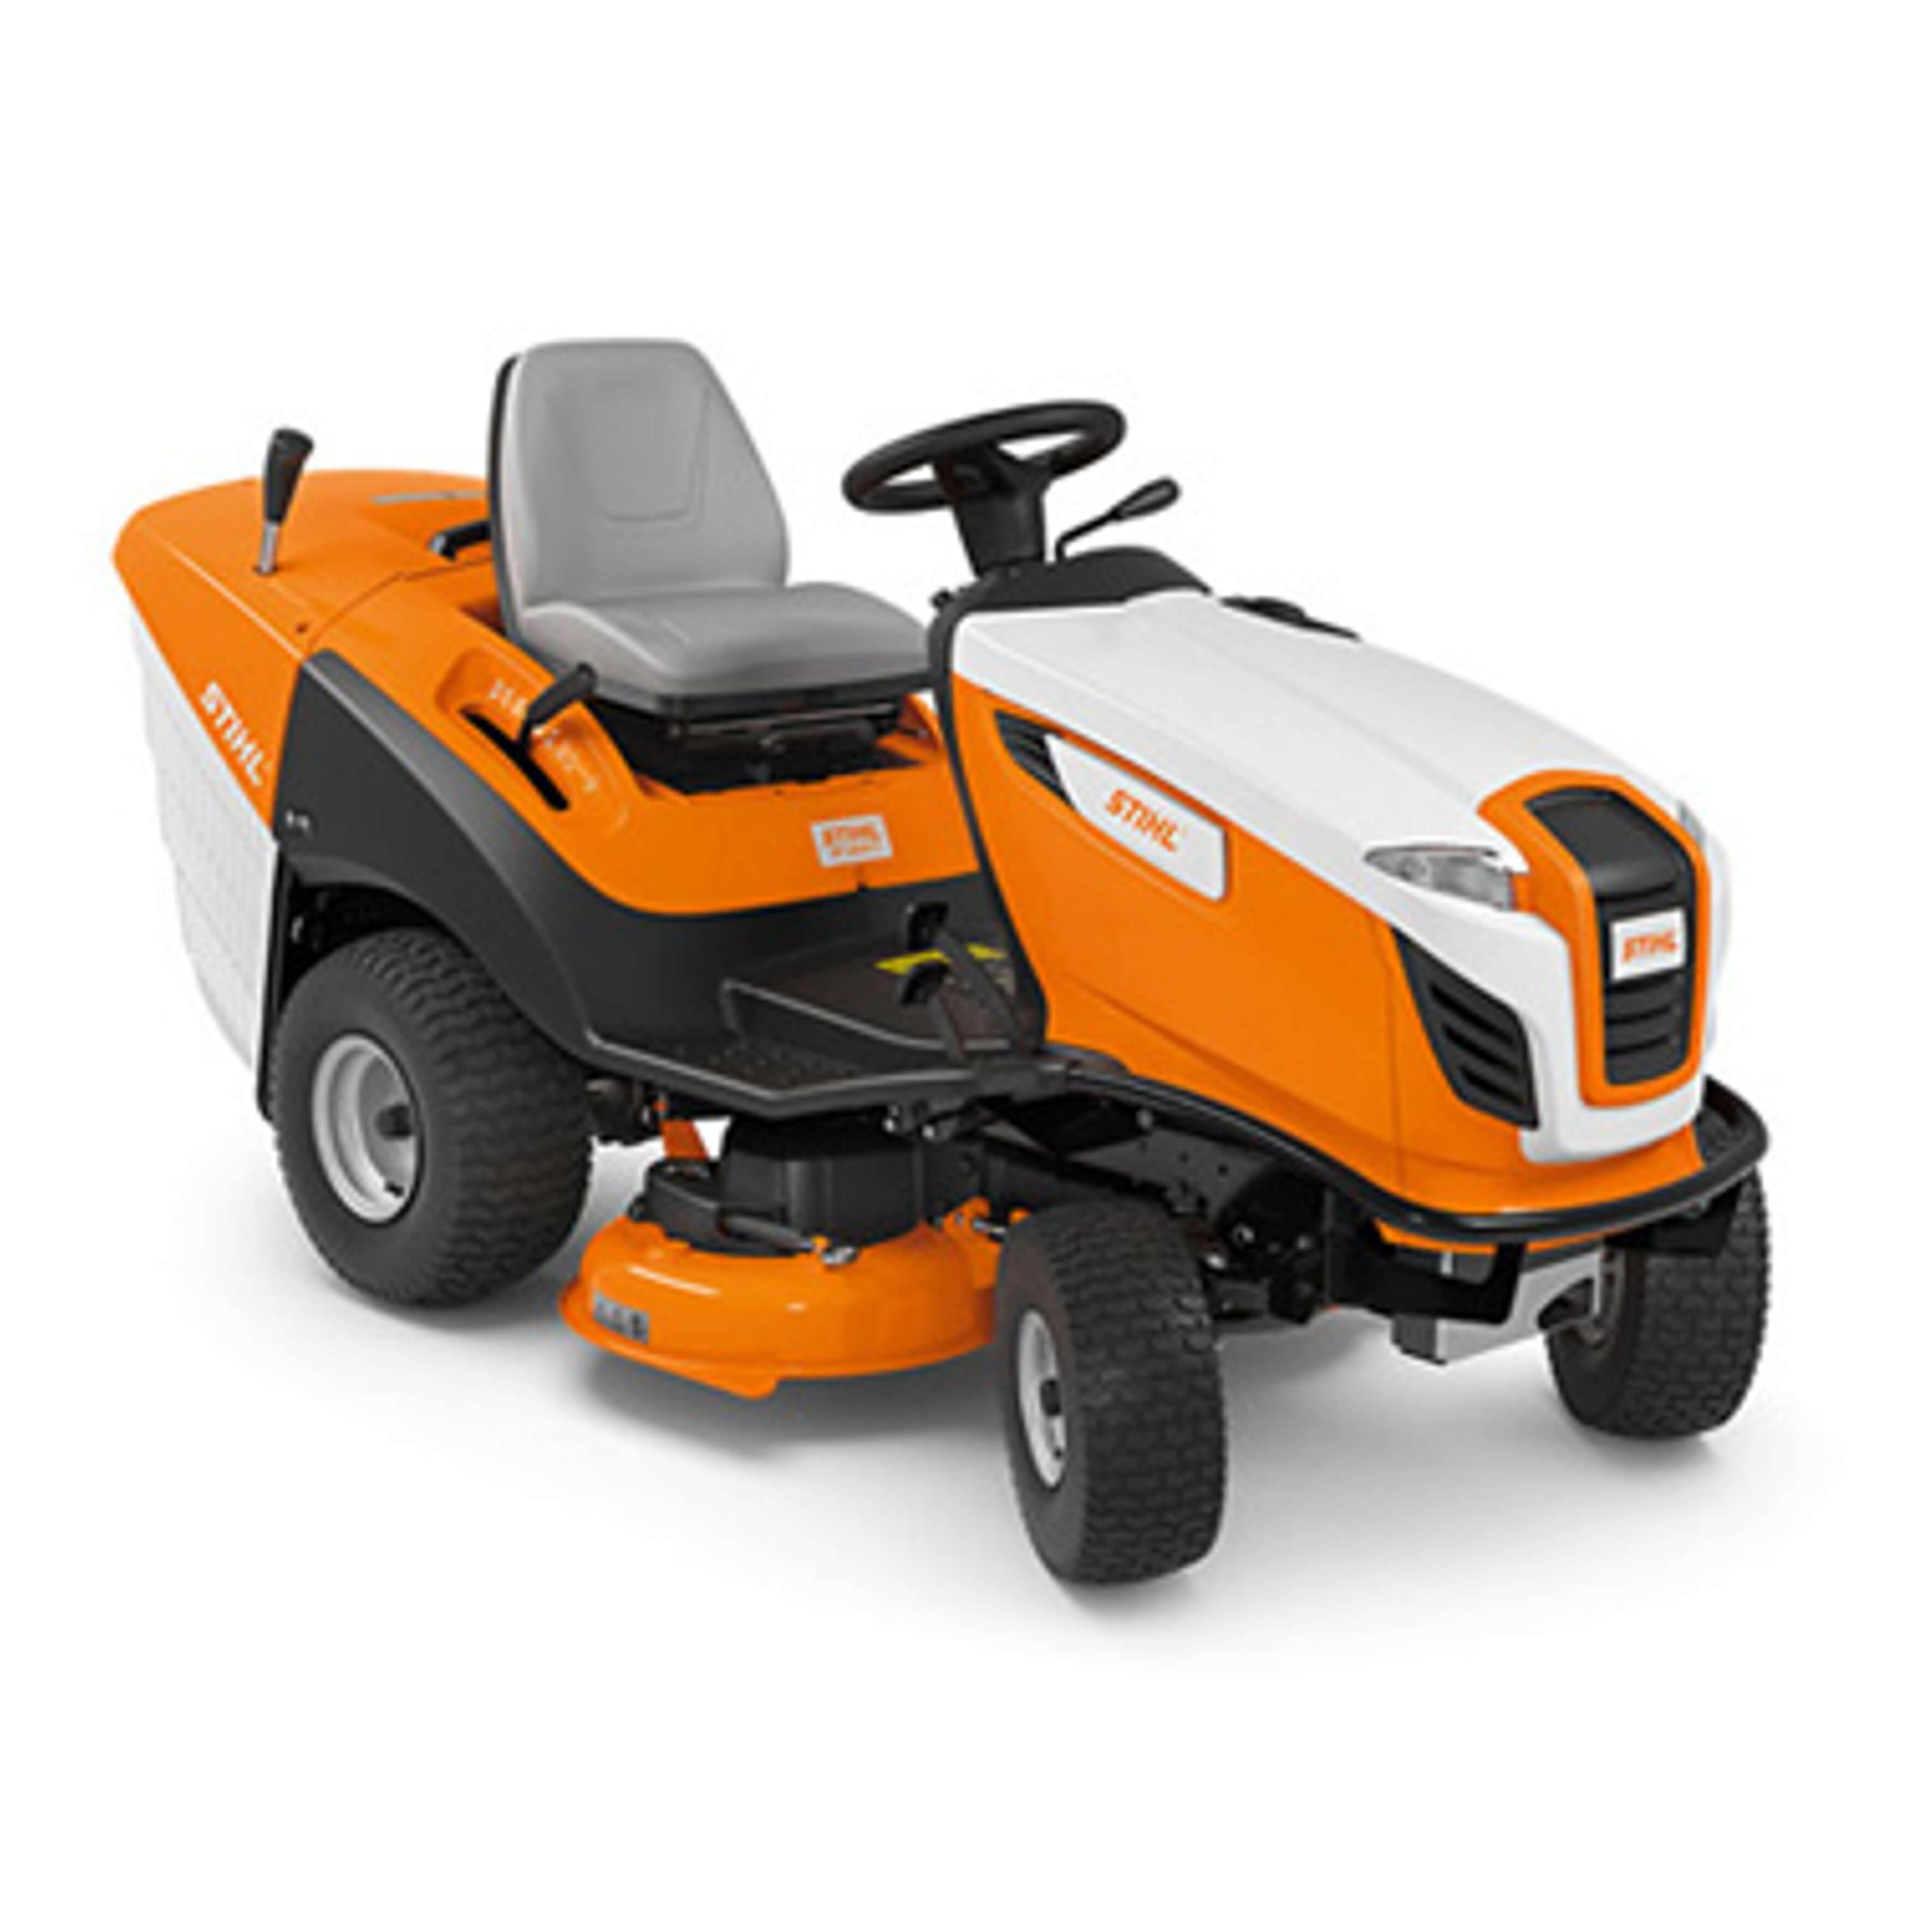 Stihl RT 5097.0 Ride on Mower Parts